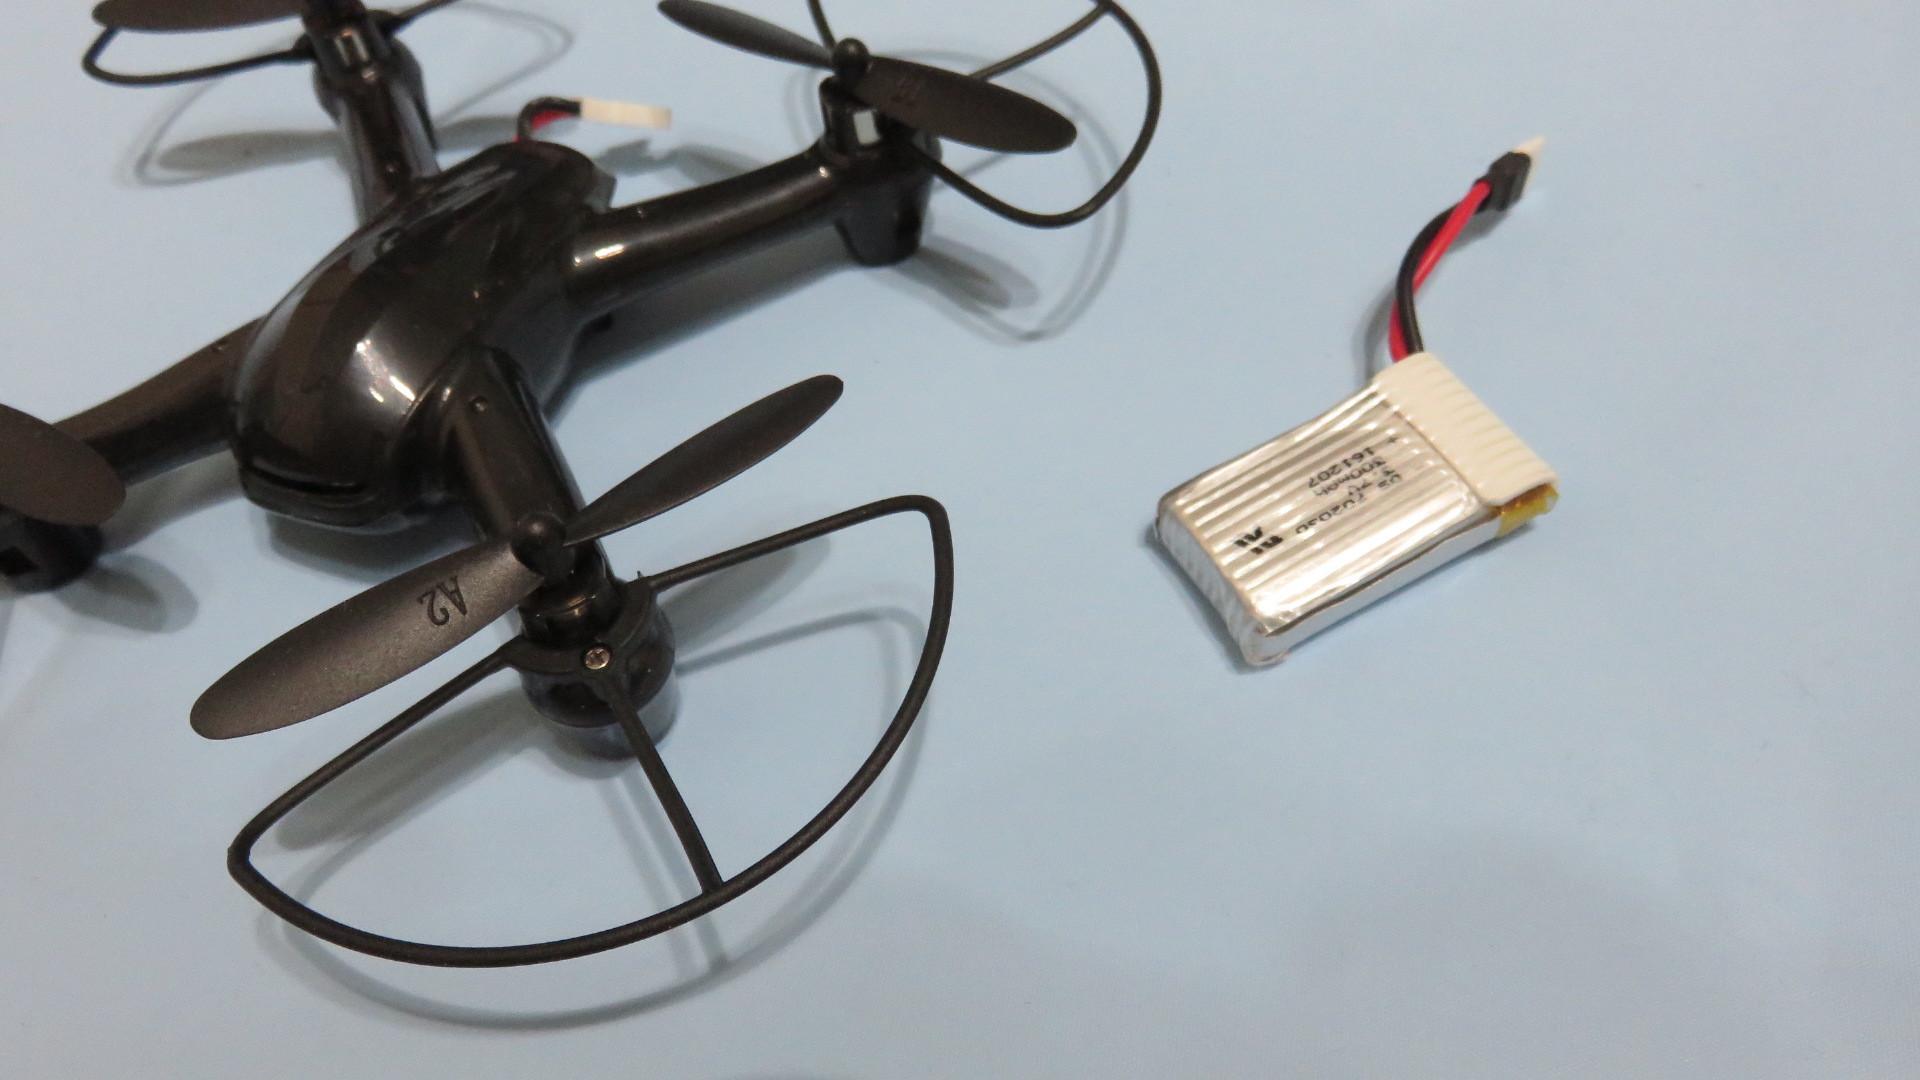 drone-05.jpg